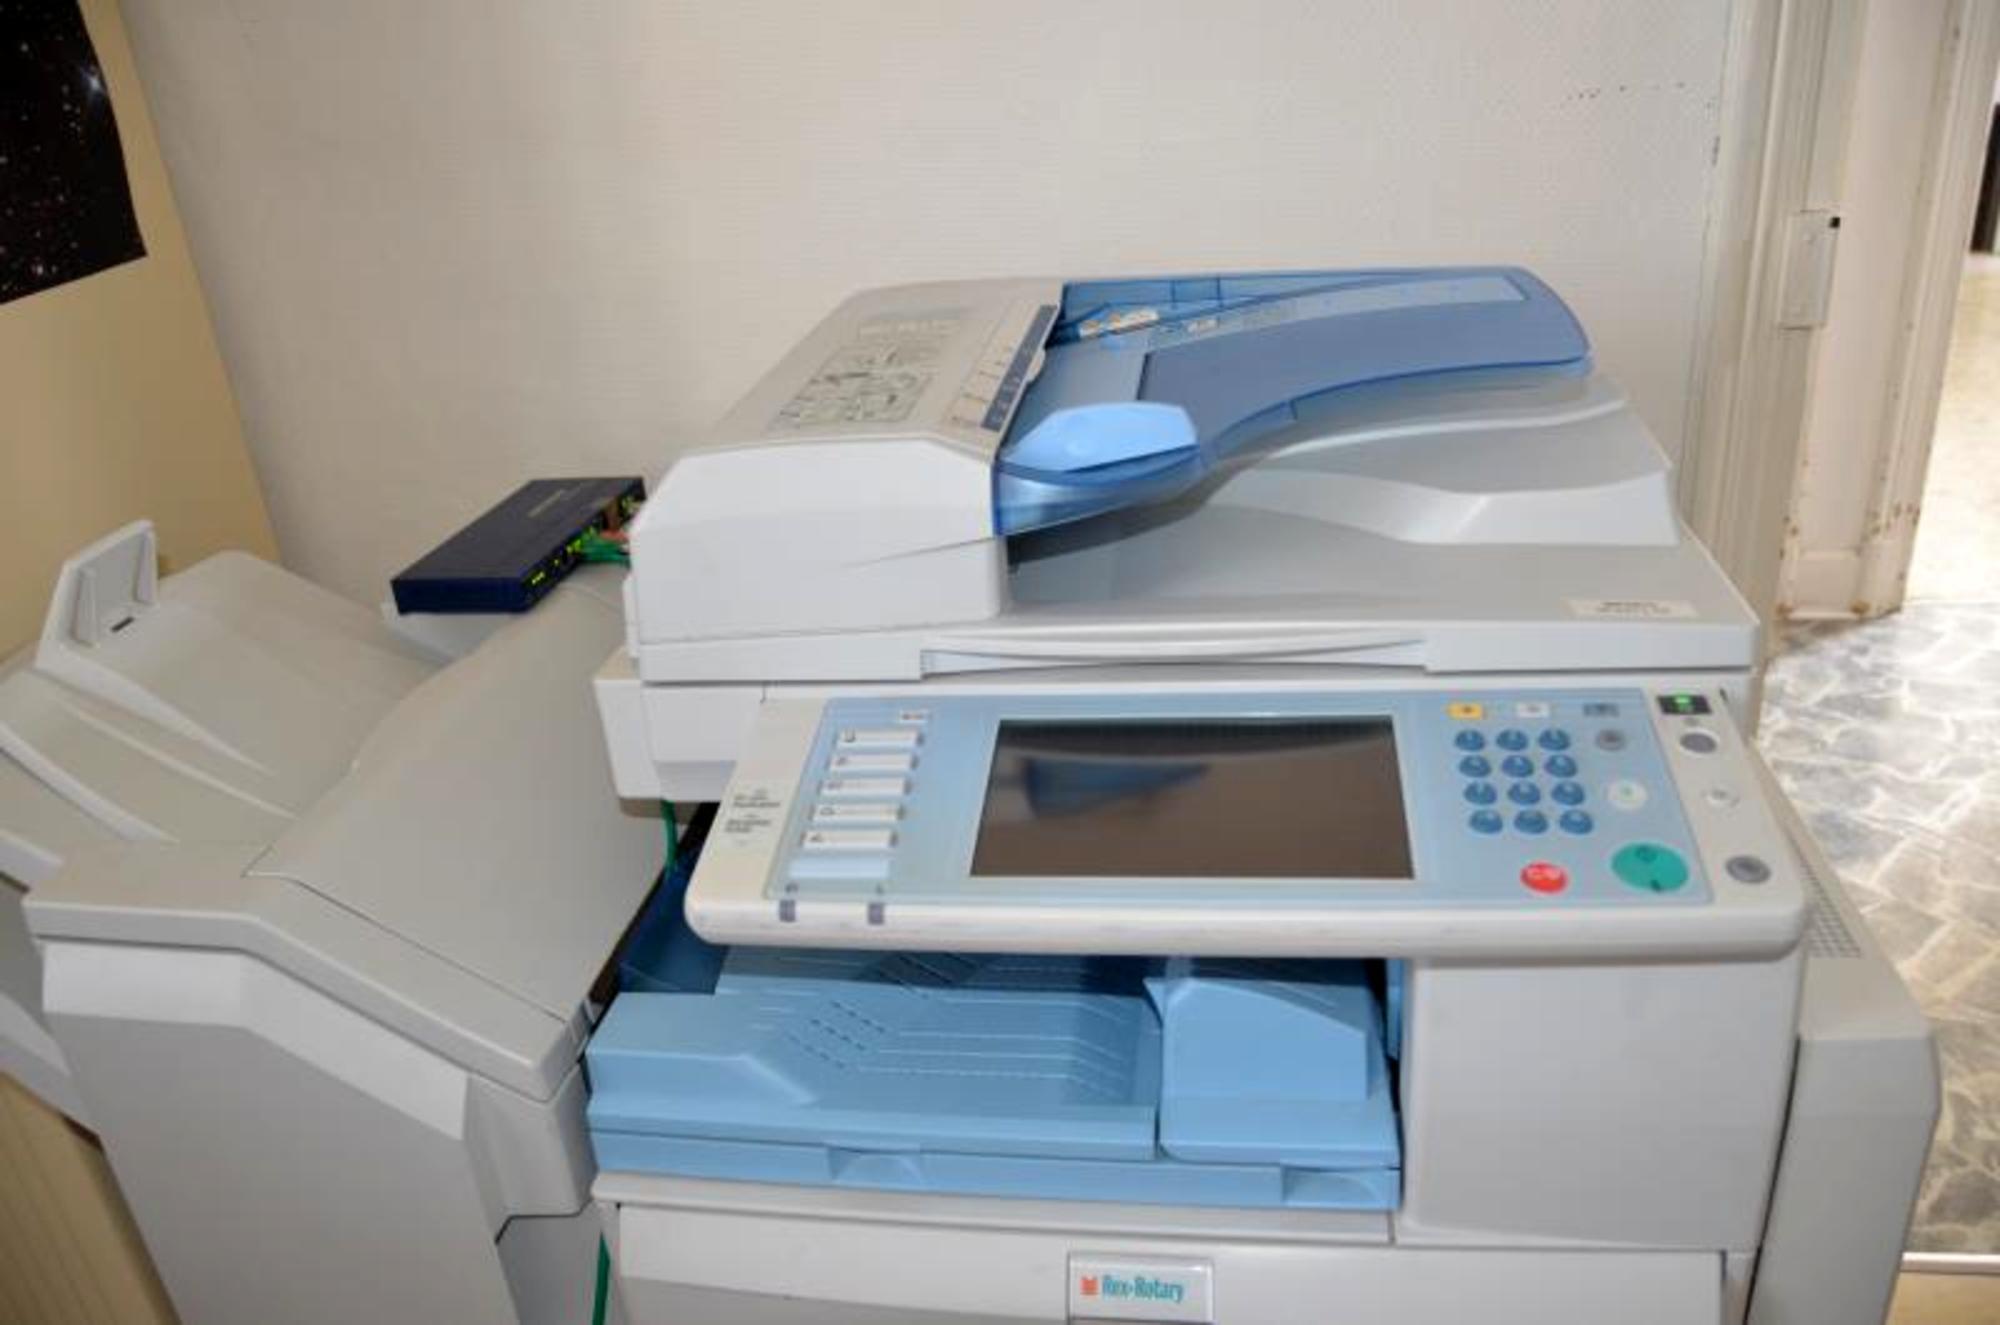 imprimante fax scanner photocopieur copieur imprimante. Black Bedroom Furniture Sets. Home Design Ideas